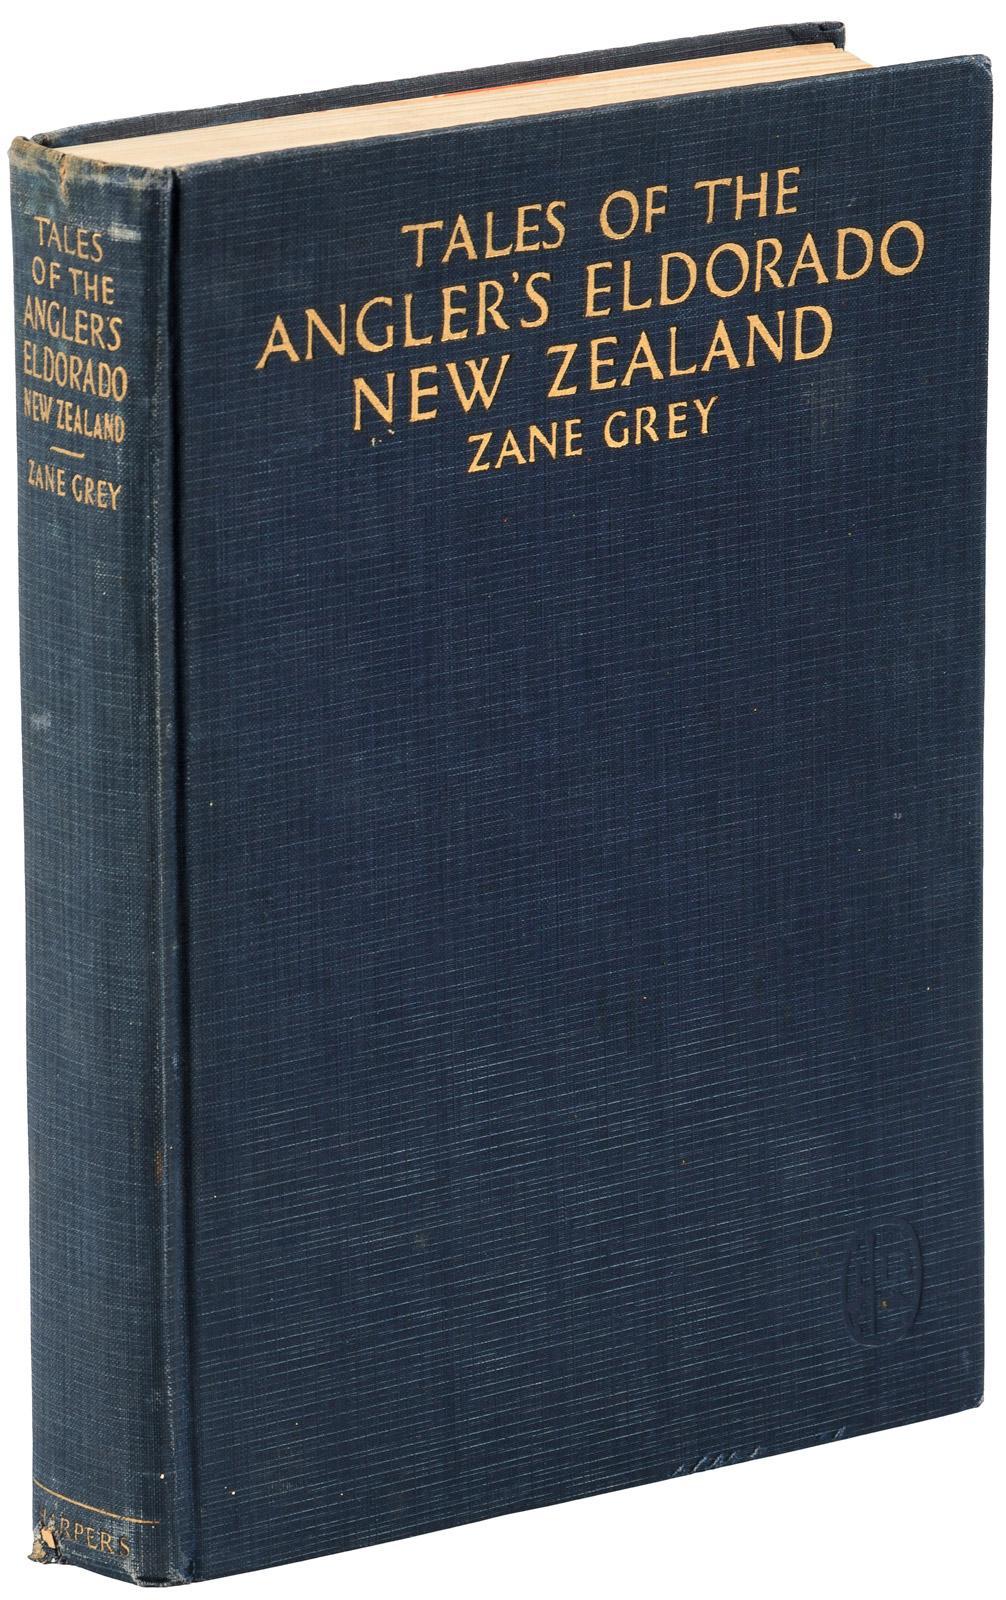 Tales of the Anglers El Dorado, New Zealand